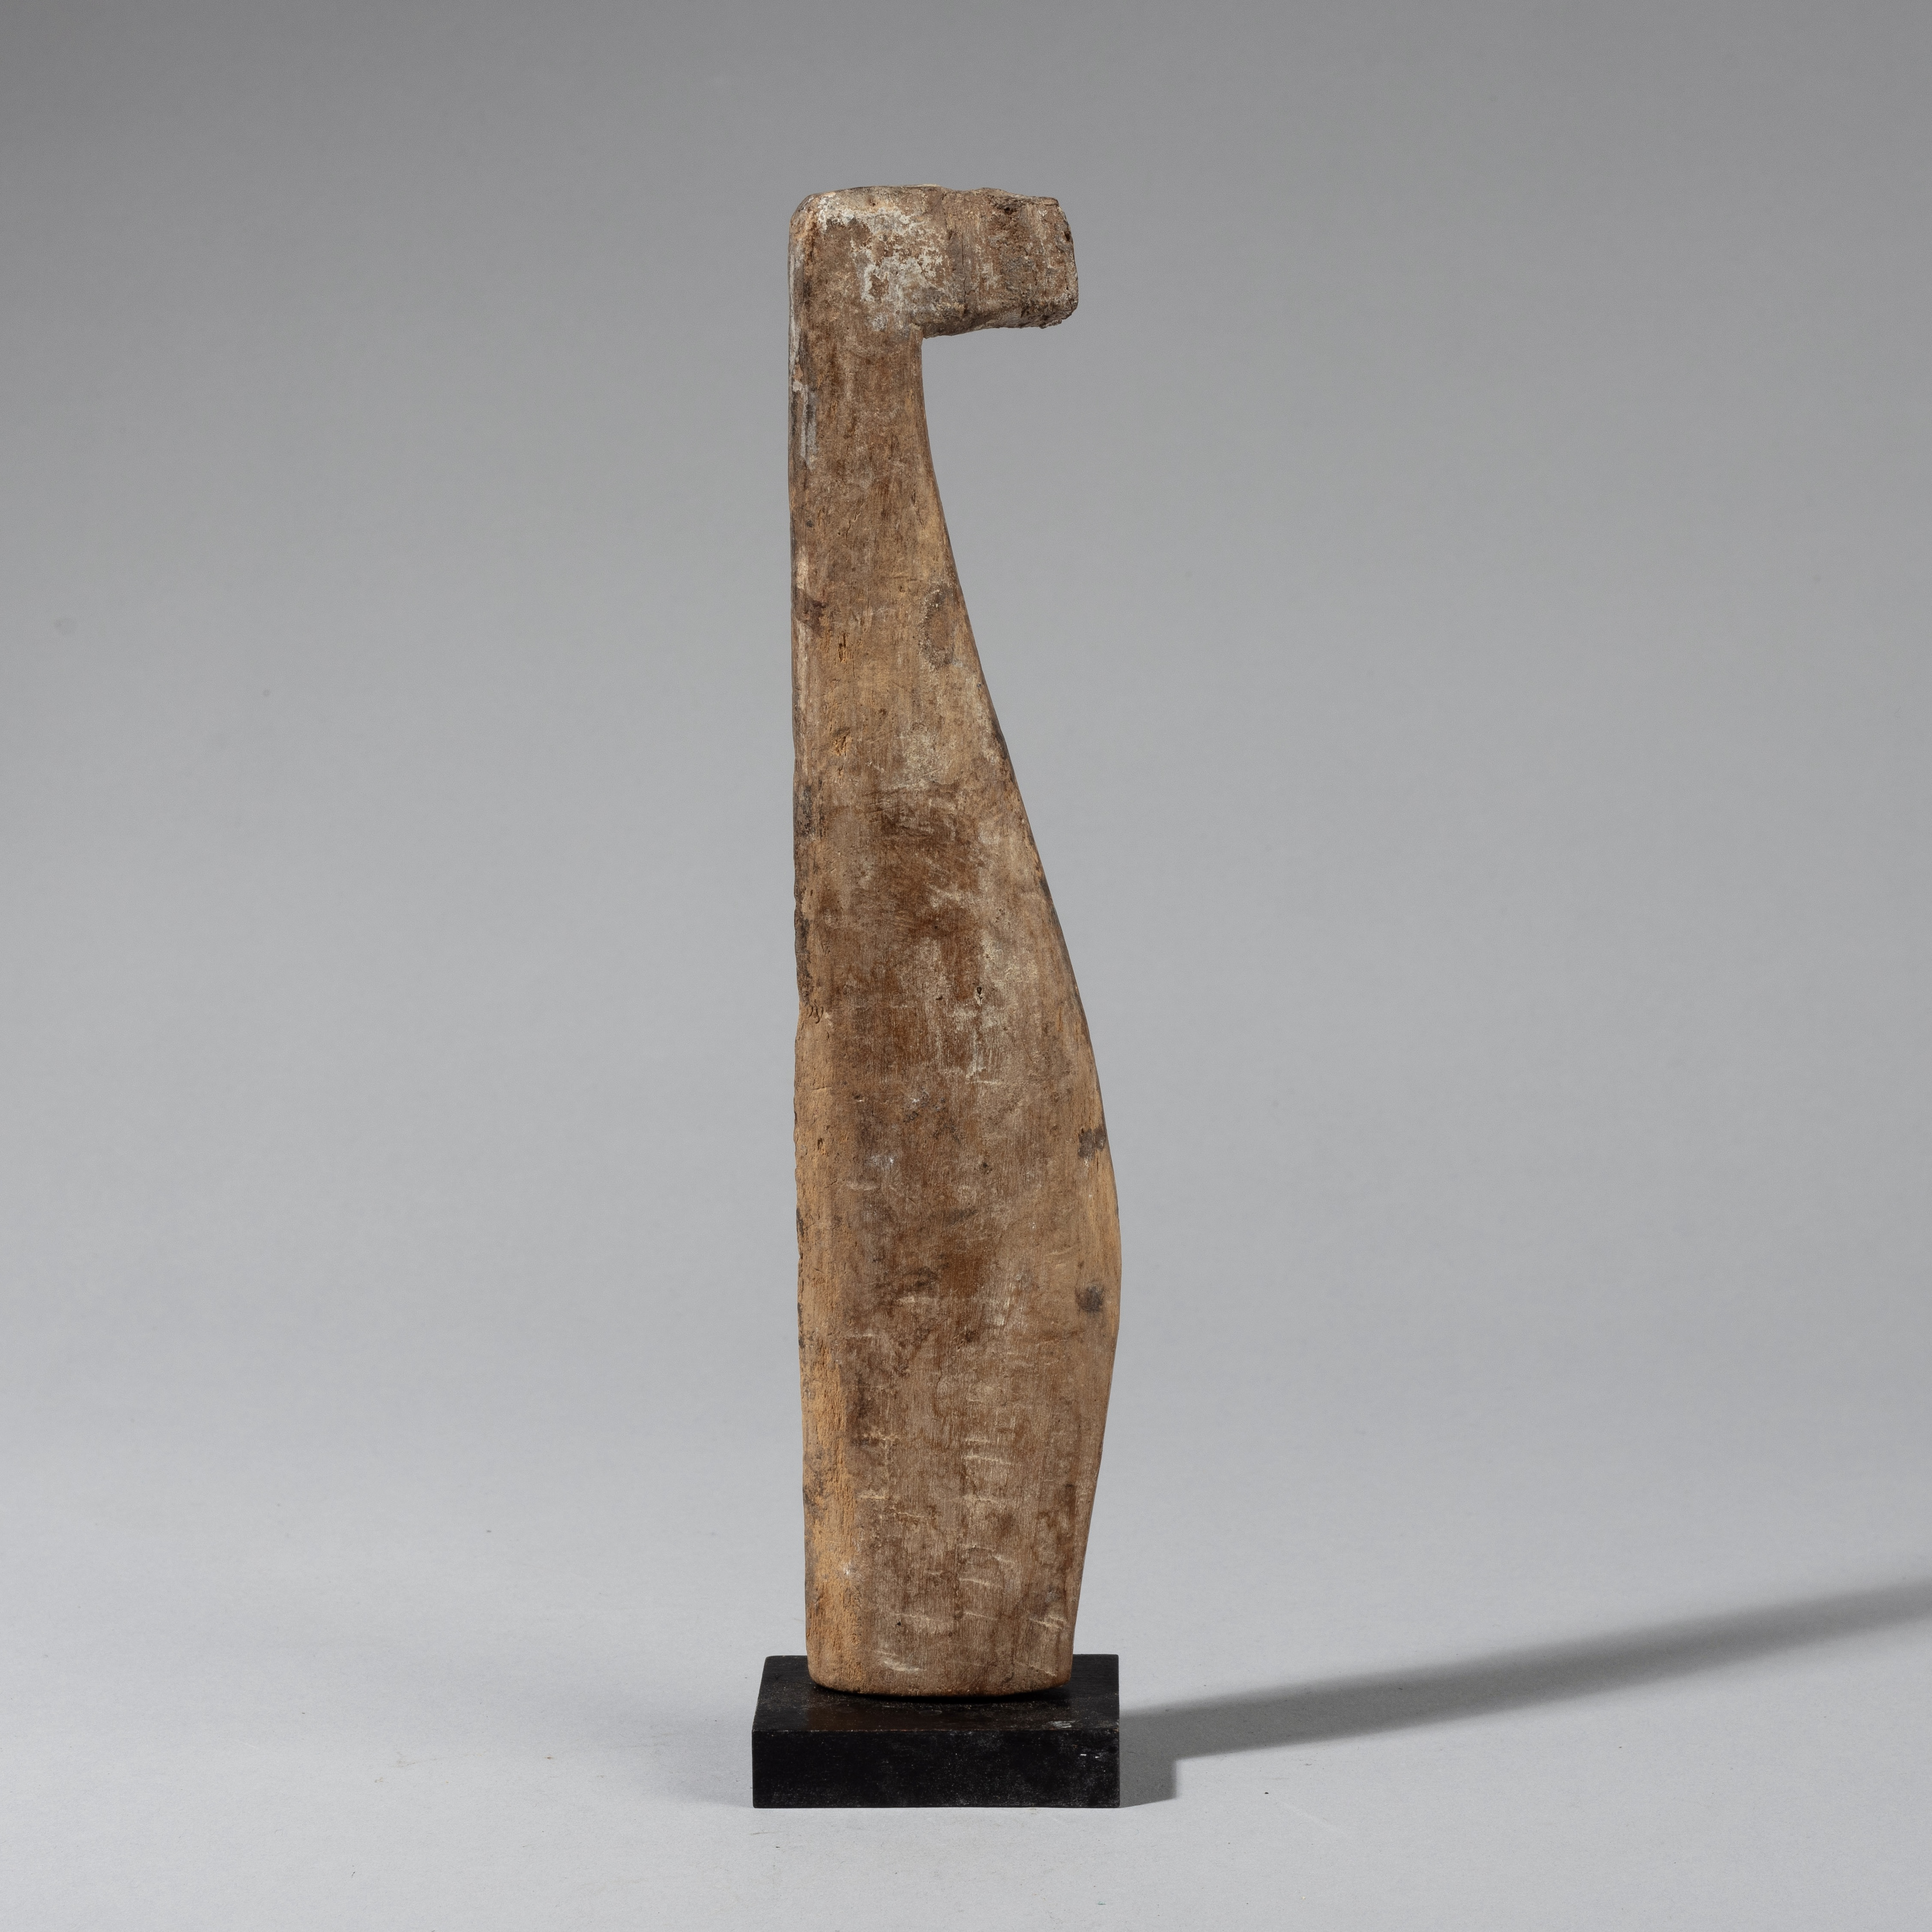 A STREAMLINED BIRD NATURE SPIRIT, ADAN TRIBE OF GHANA W AFRICA ( No 4321)